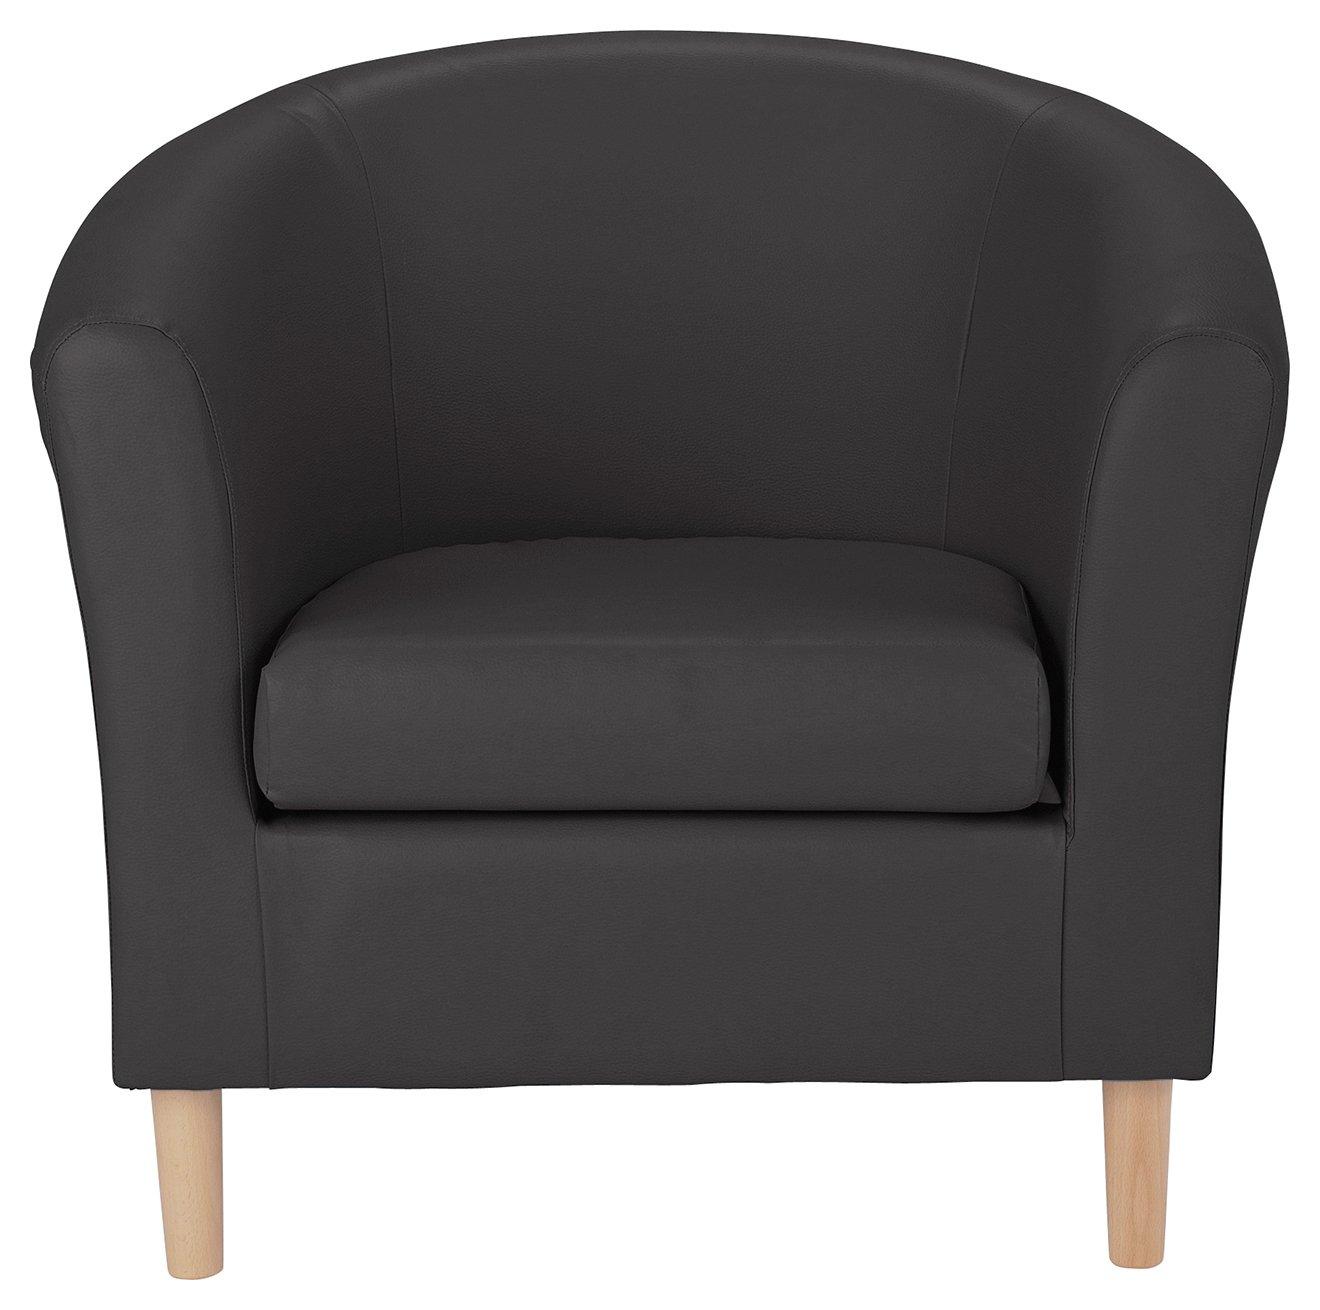 Argos Home Leather Effect Tub Chair   Black